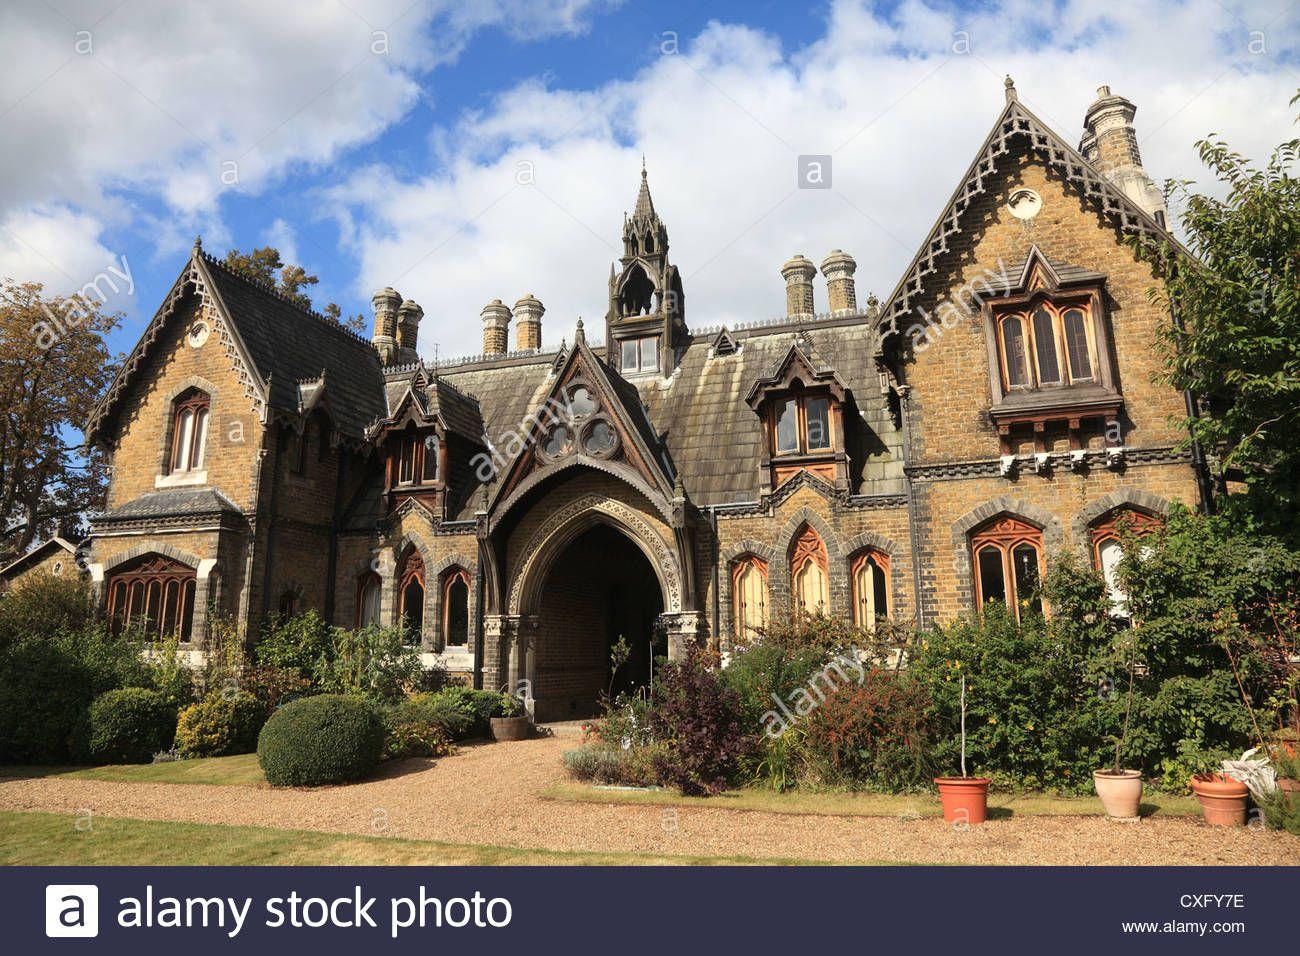 Gothic House Architecture England Buscar Con Google